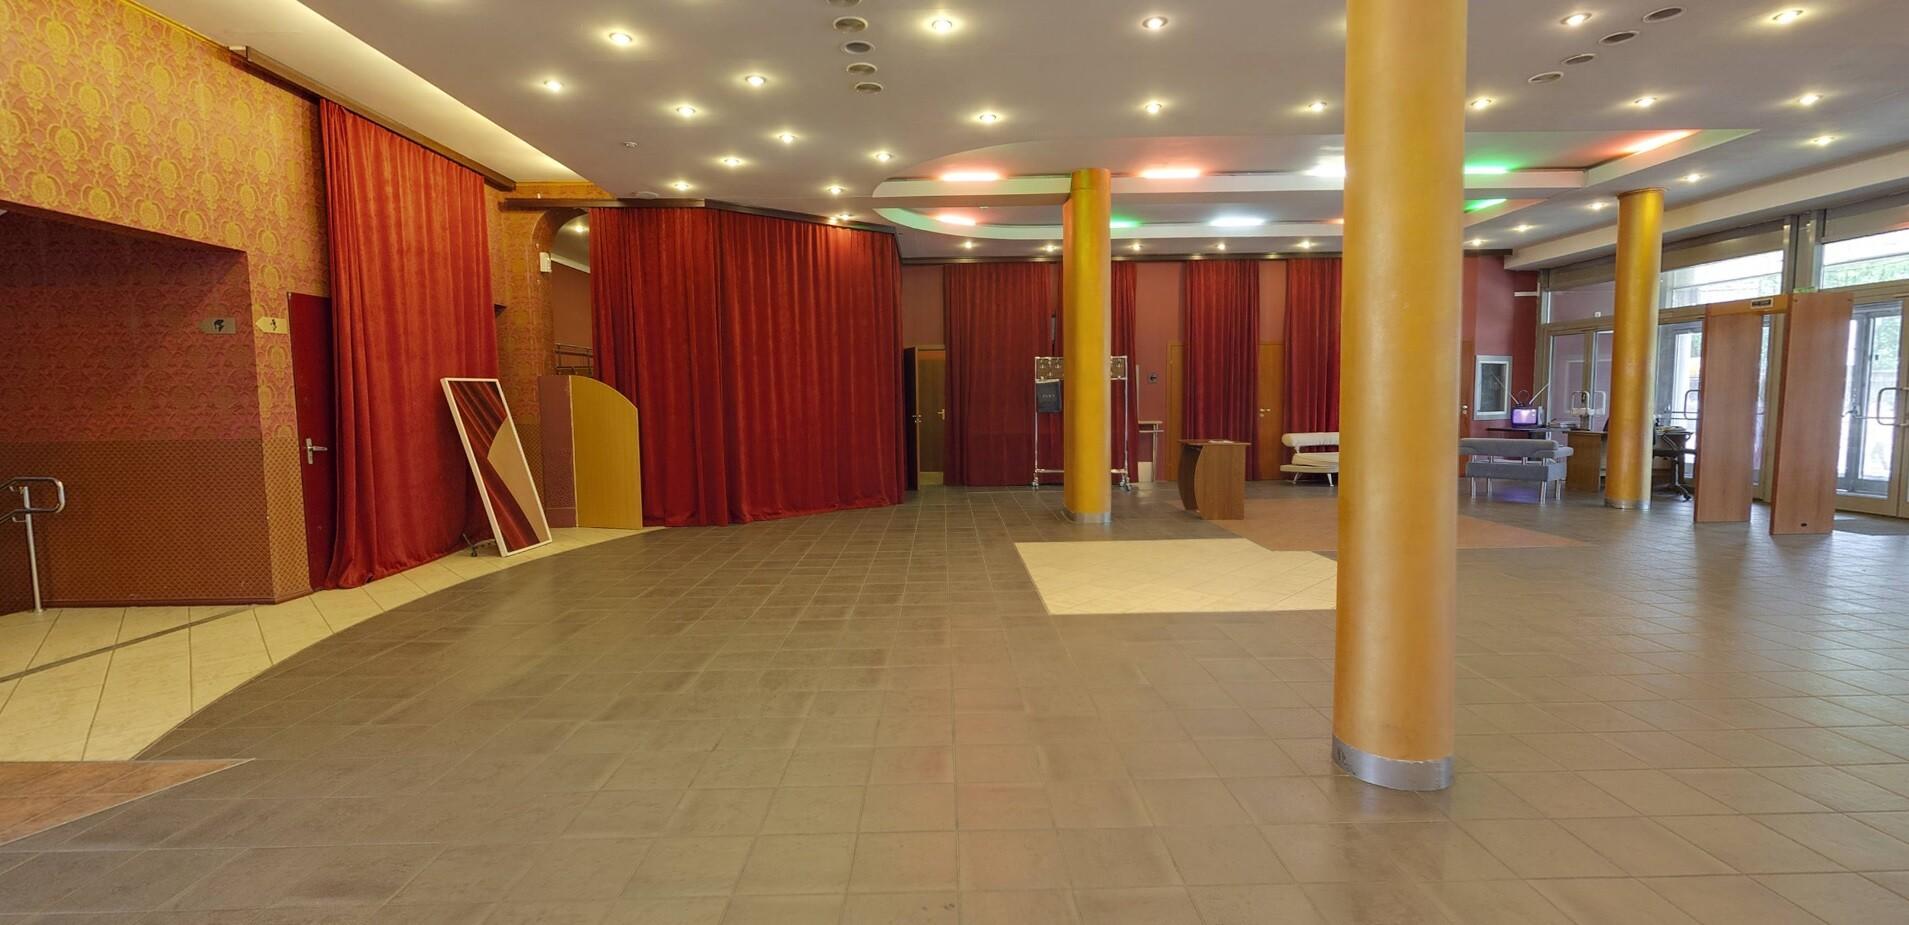 Московский Мюзик-Холл